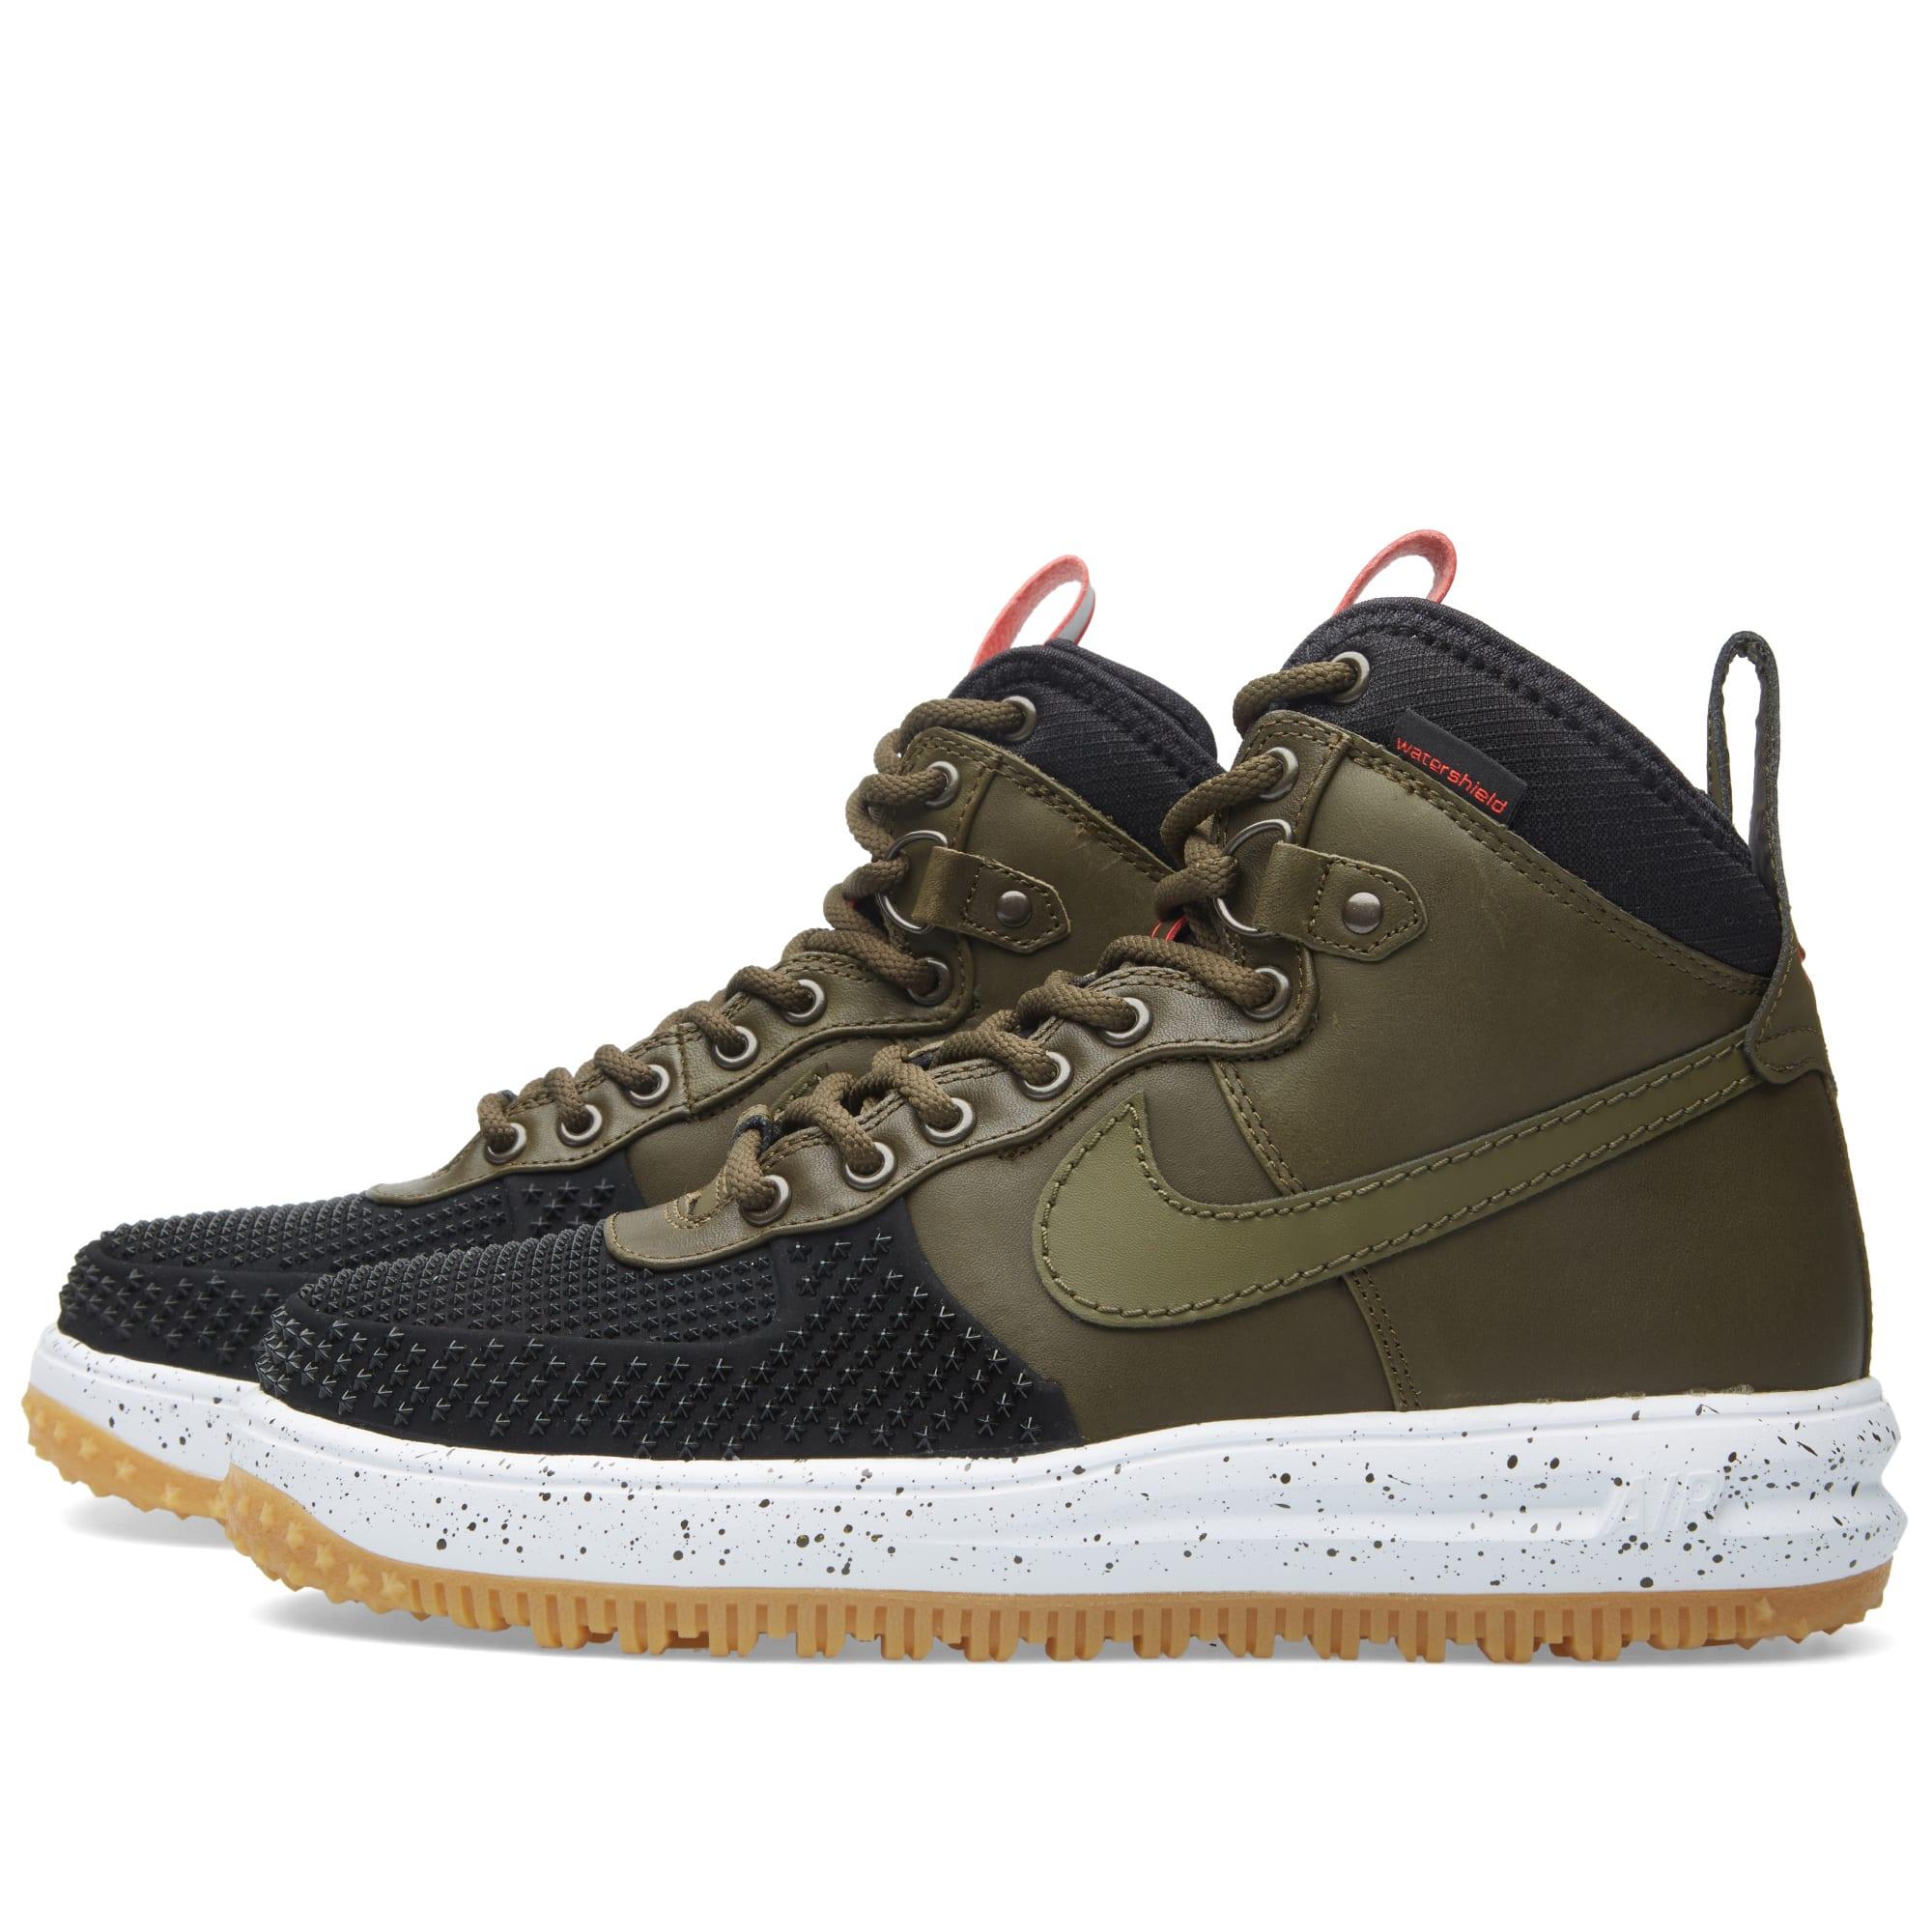 buy online 7c6dd 31d0f Nike Lunar Force 1 Duckboot Black   Dark Loden   END.